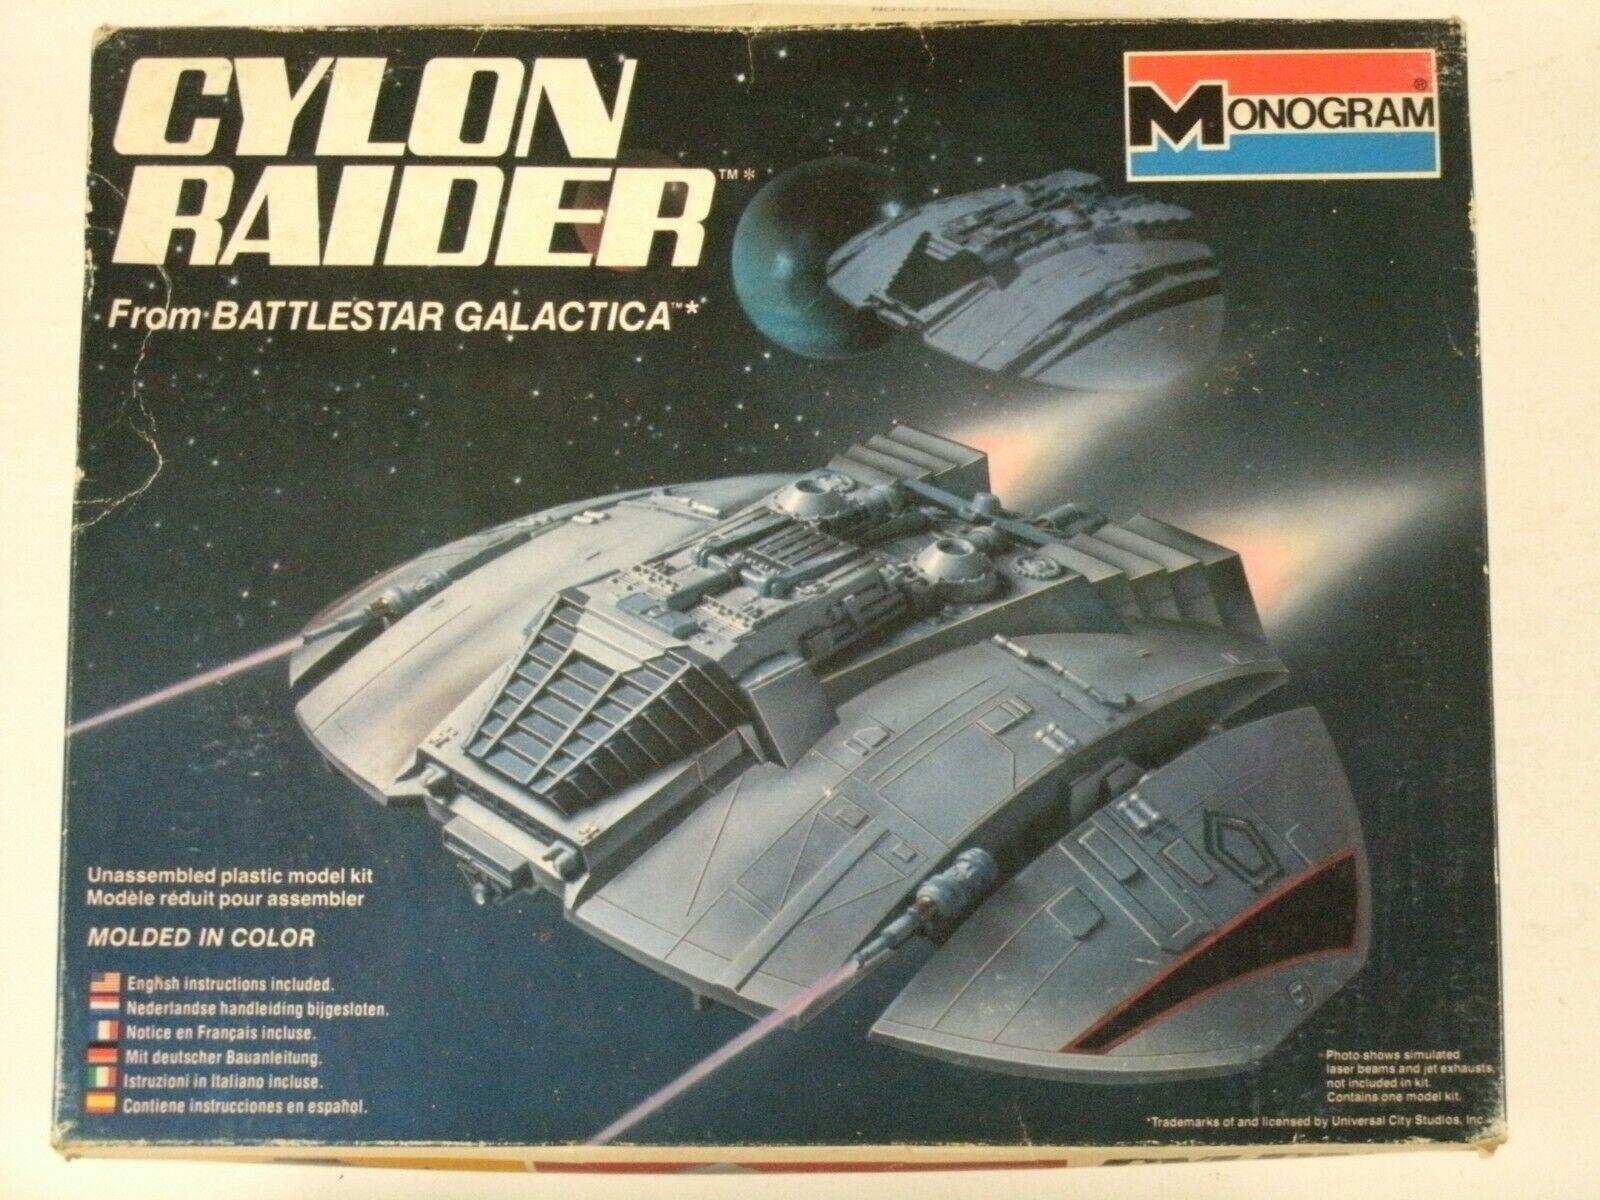 Vintage Monogram Battlestar Galactica Cylon Raider Model kit